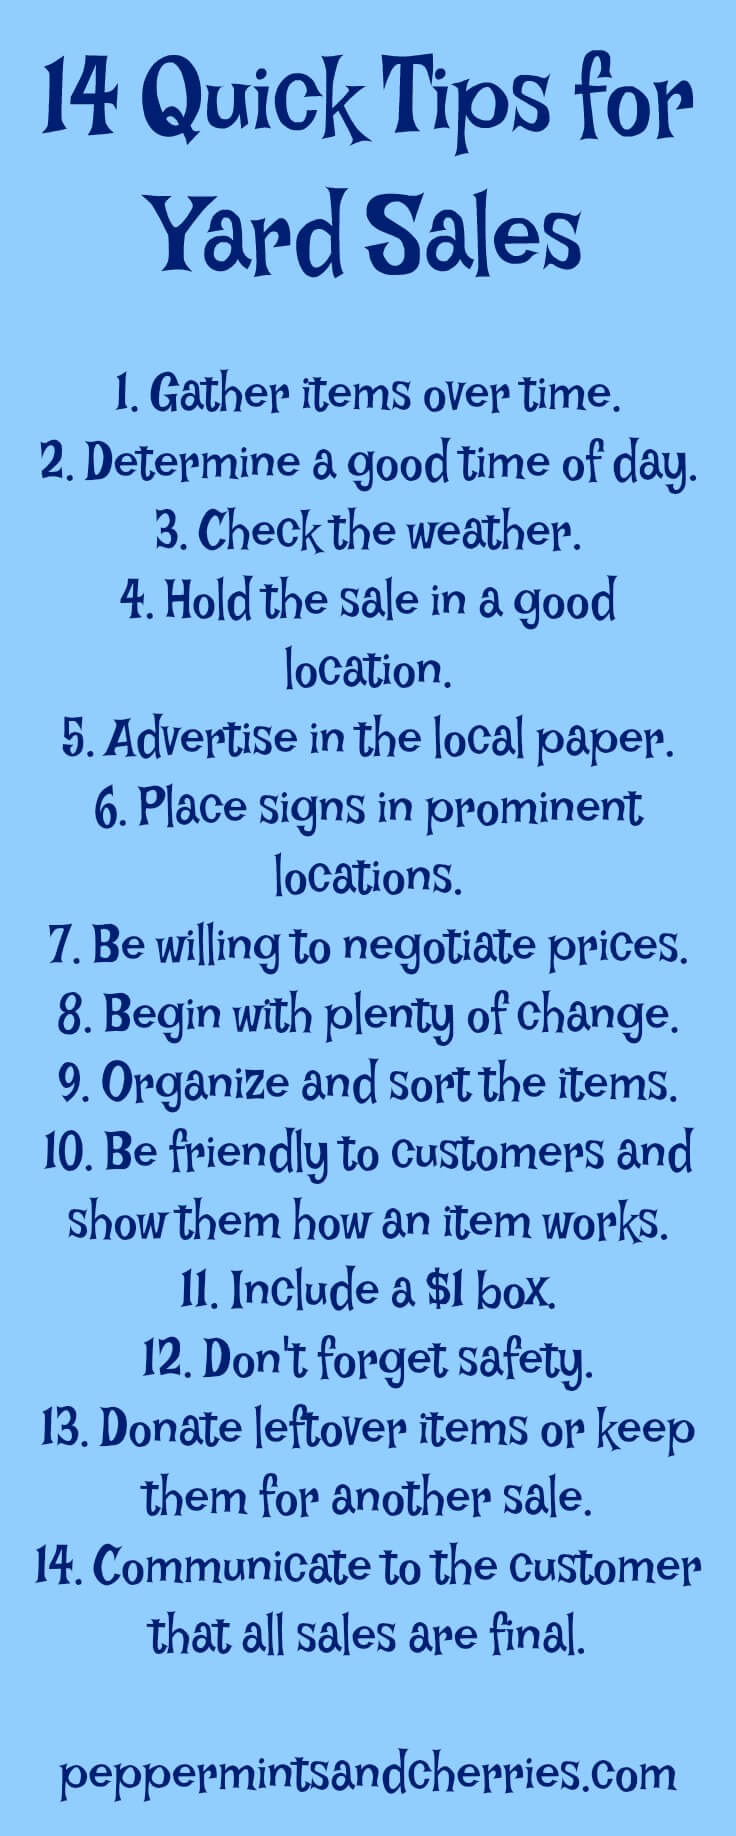 14 Quick Tips for Yard Sales www.peppermintsandcherries.com